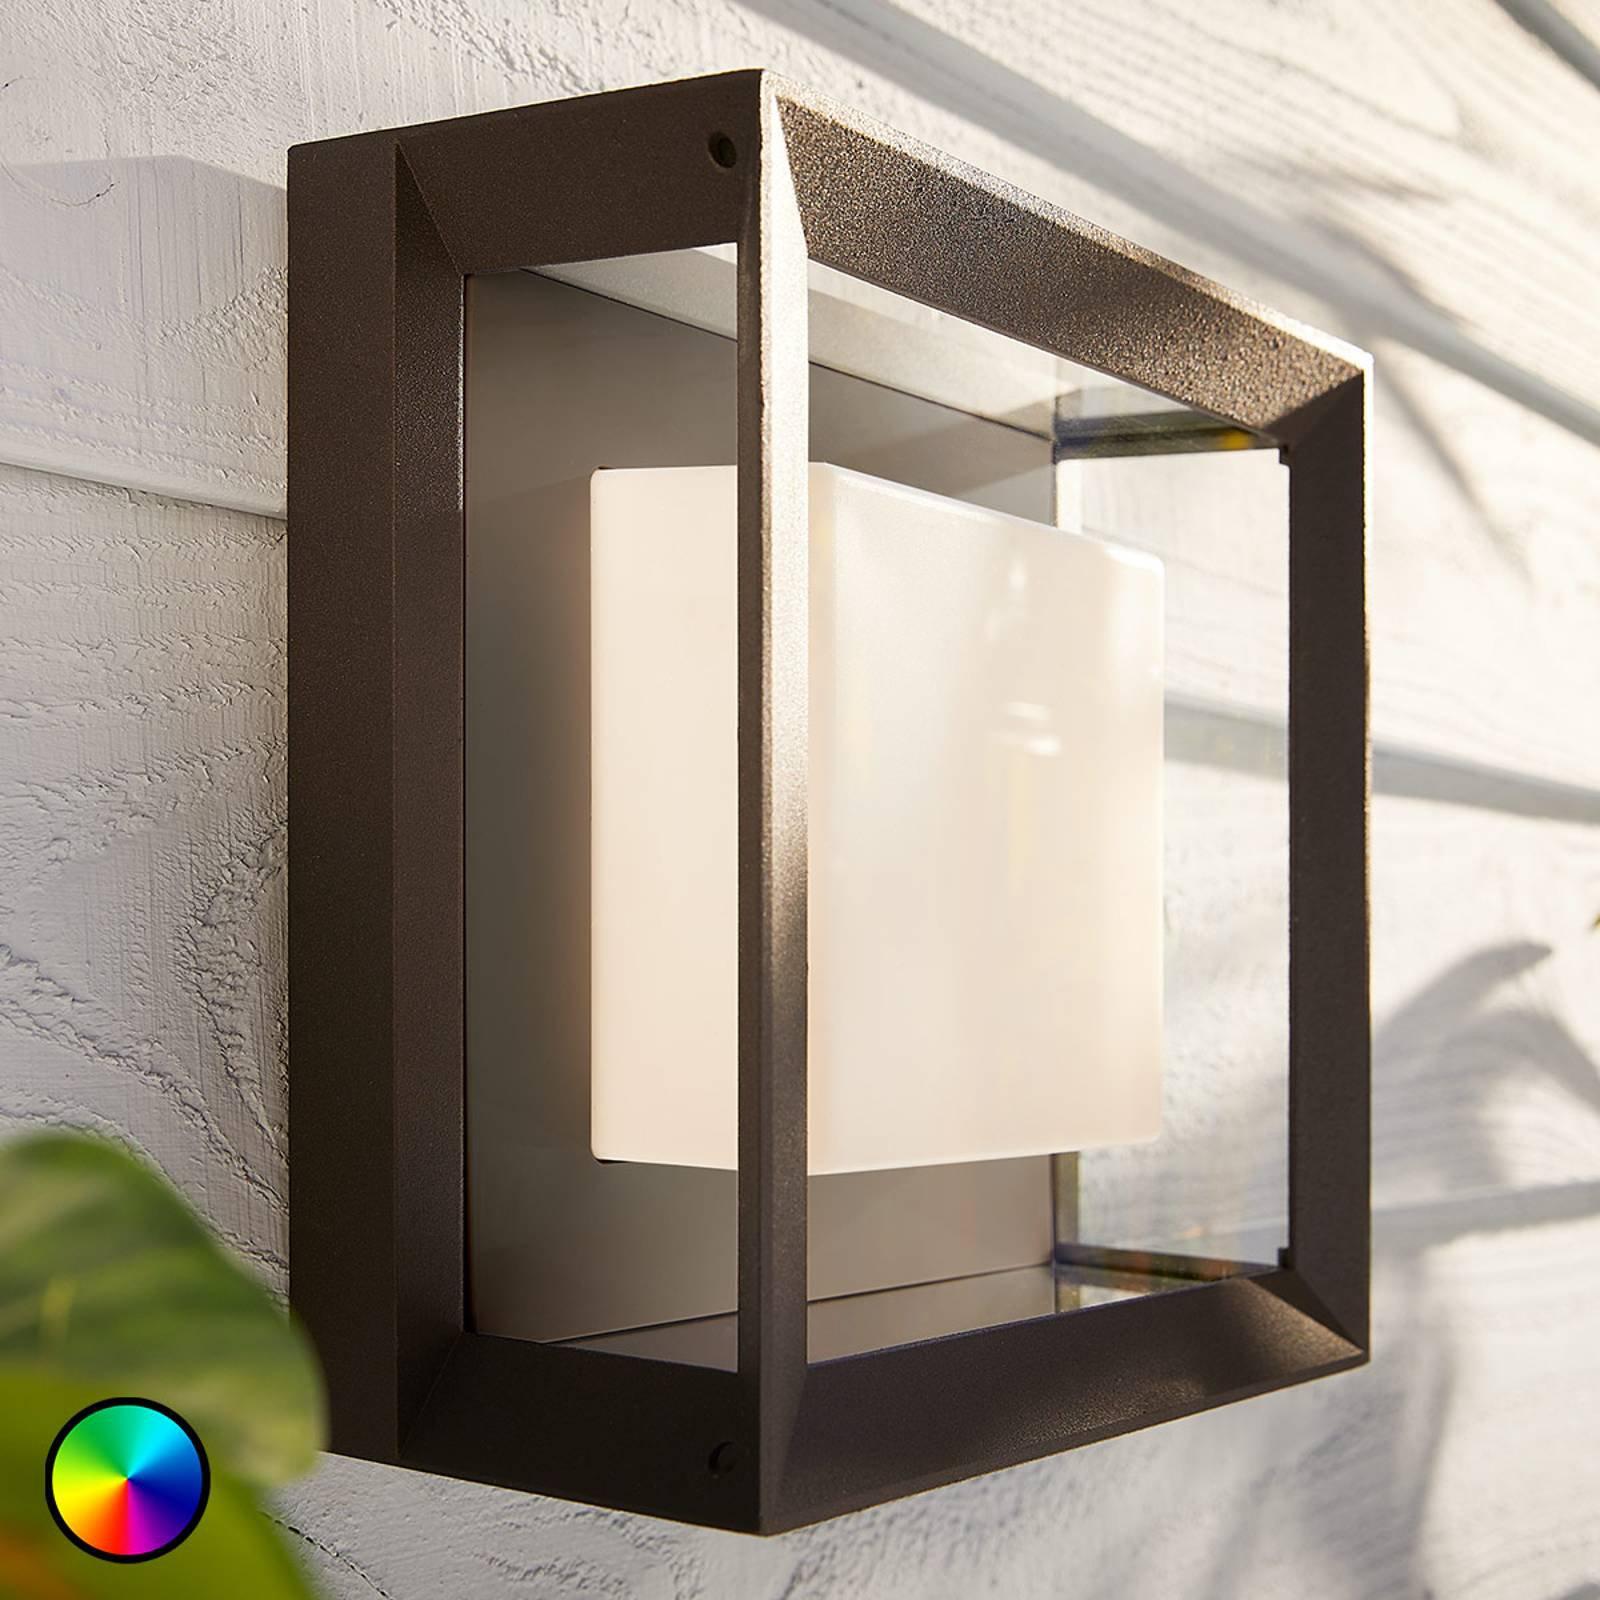 Philips Hue White+Color Econic vegglampe firkantet